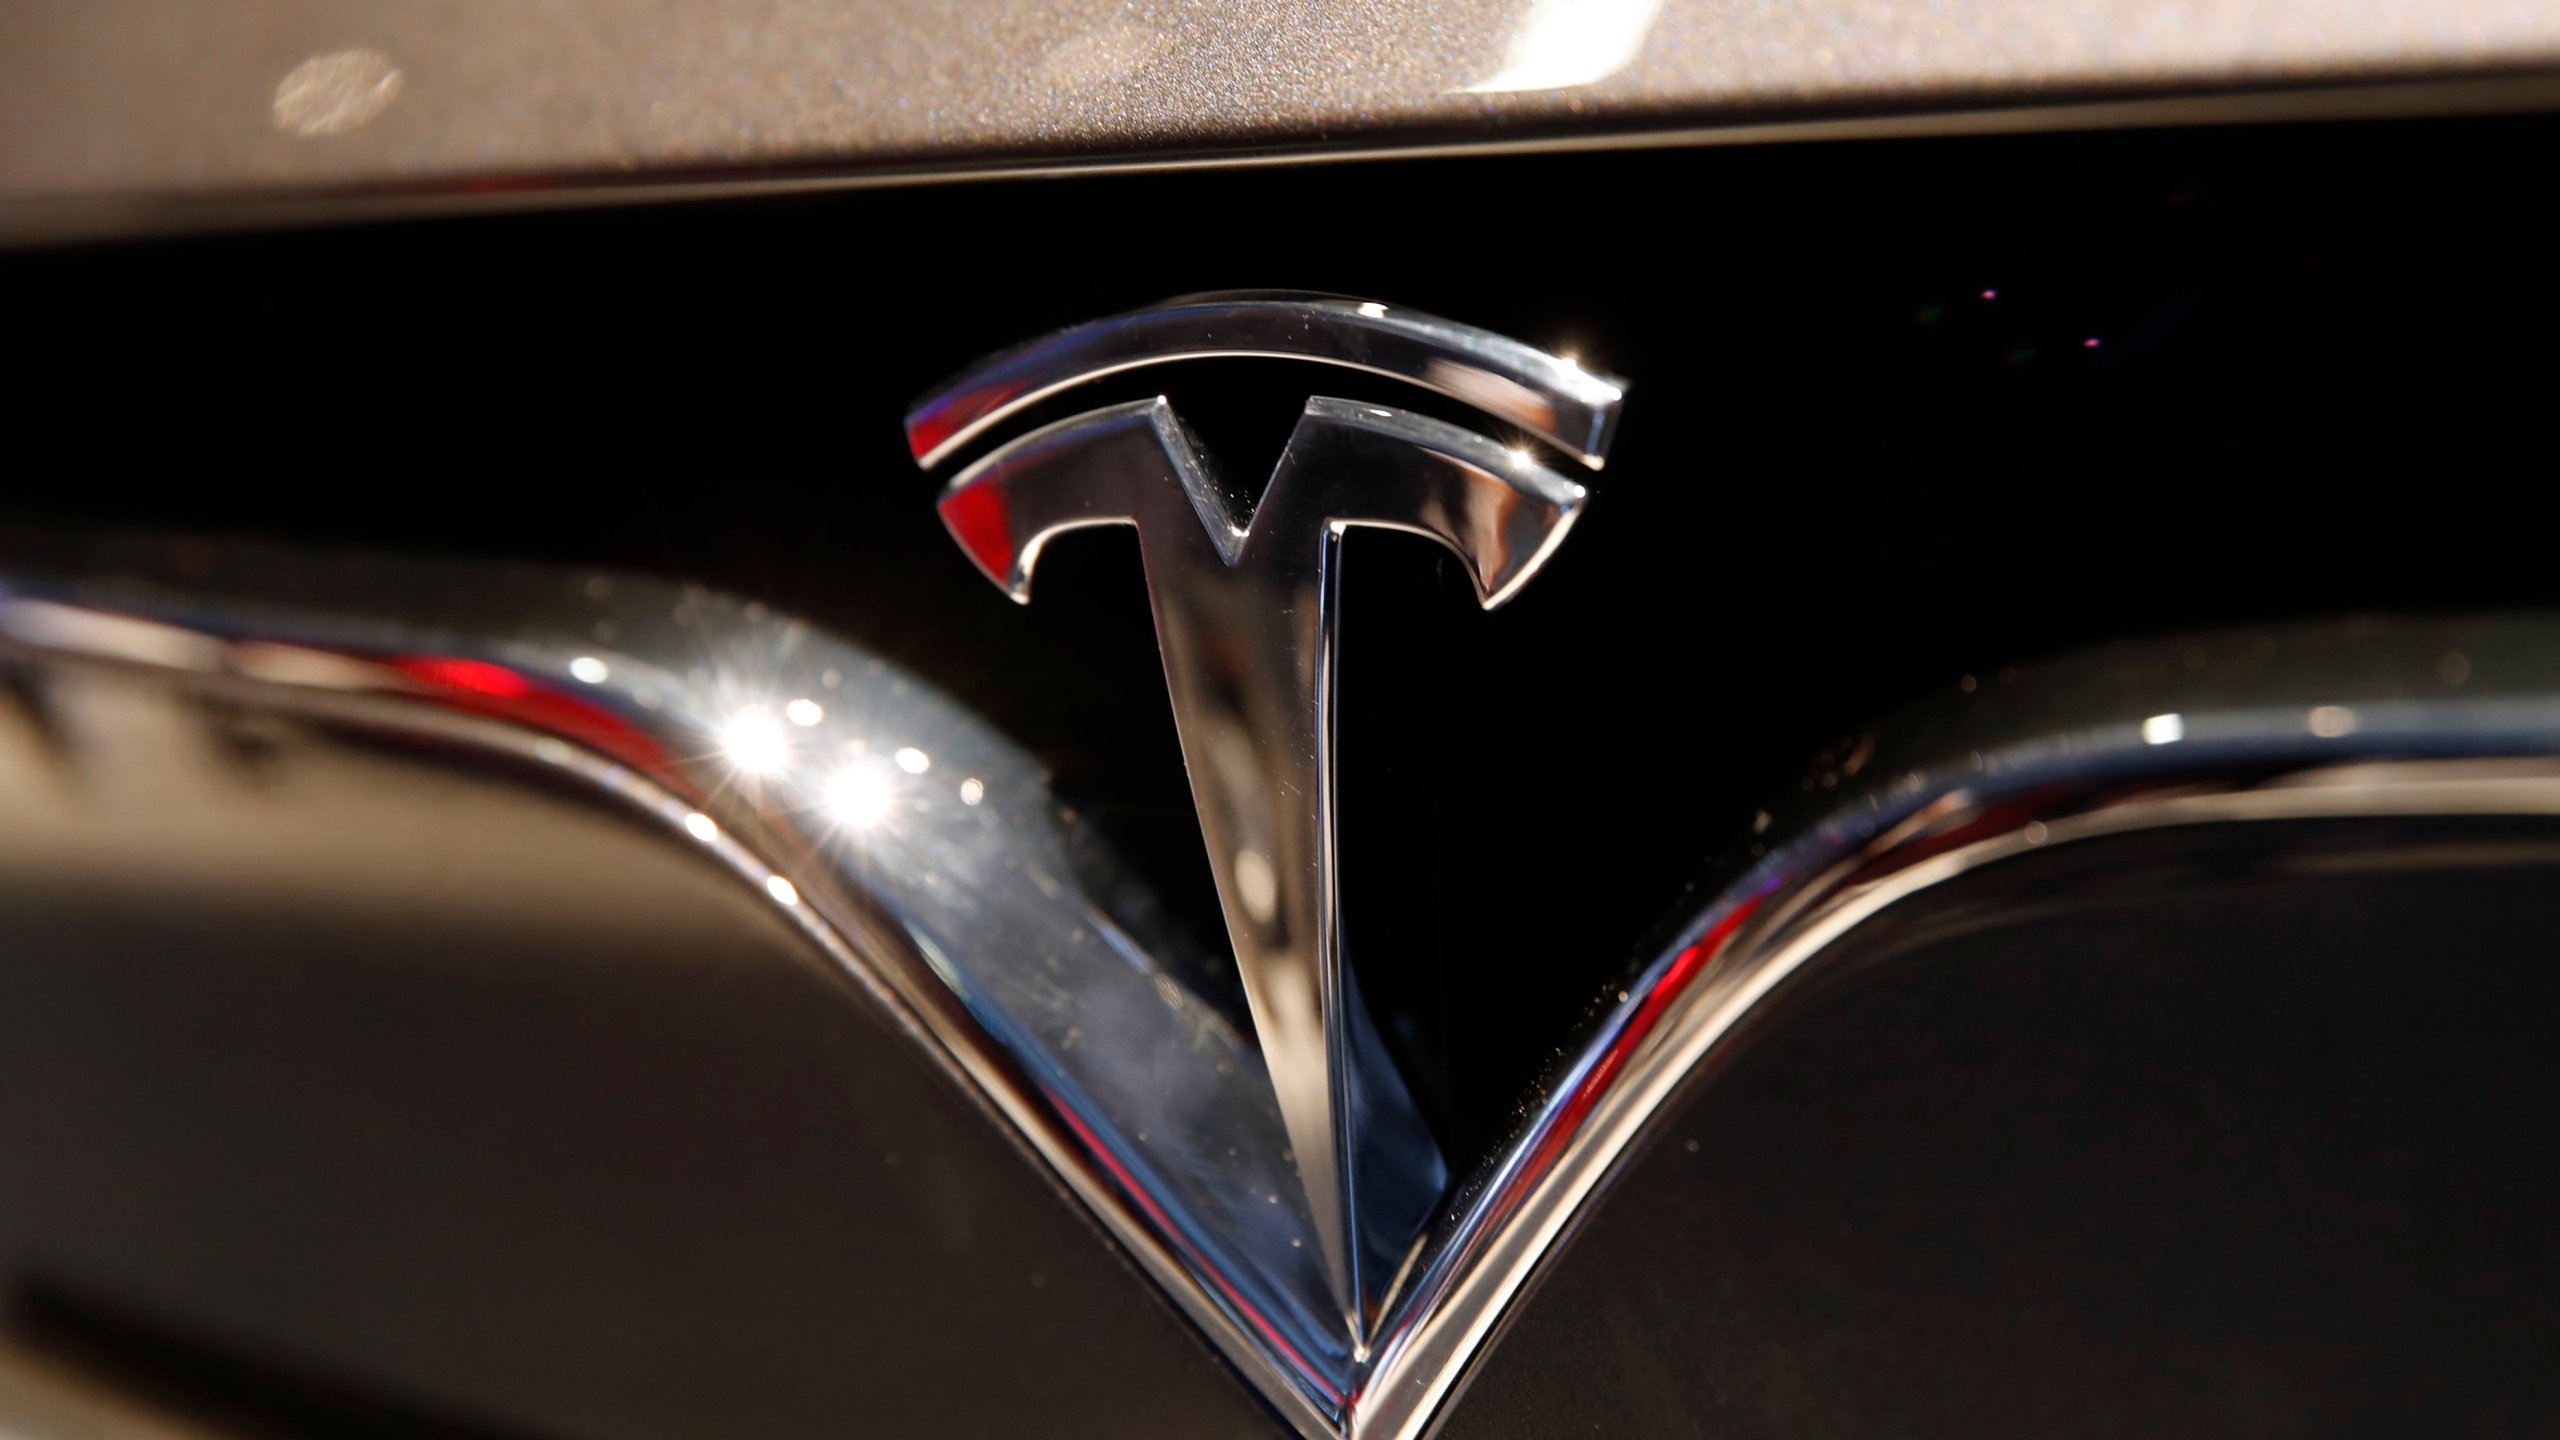 Tesla_Fast_Facts_36023-159532.jpg77467844